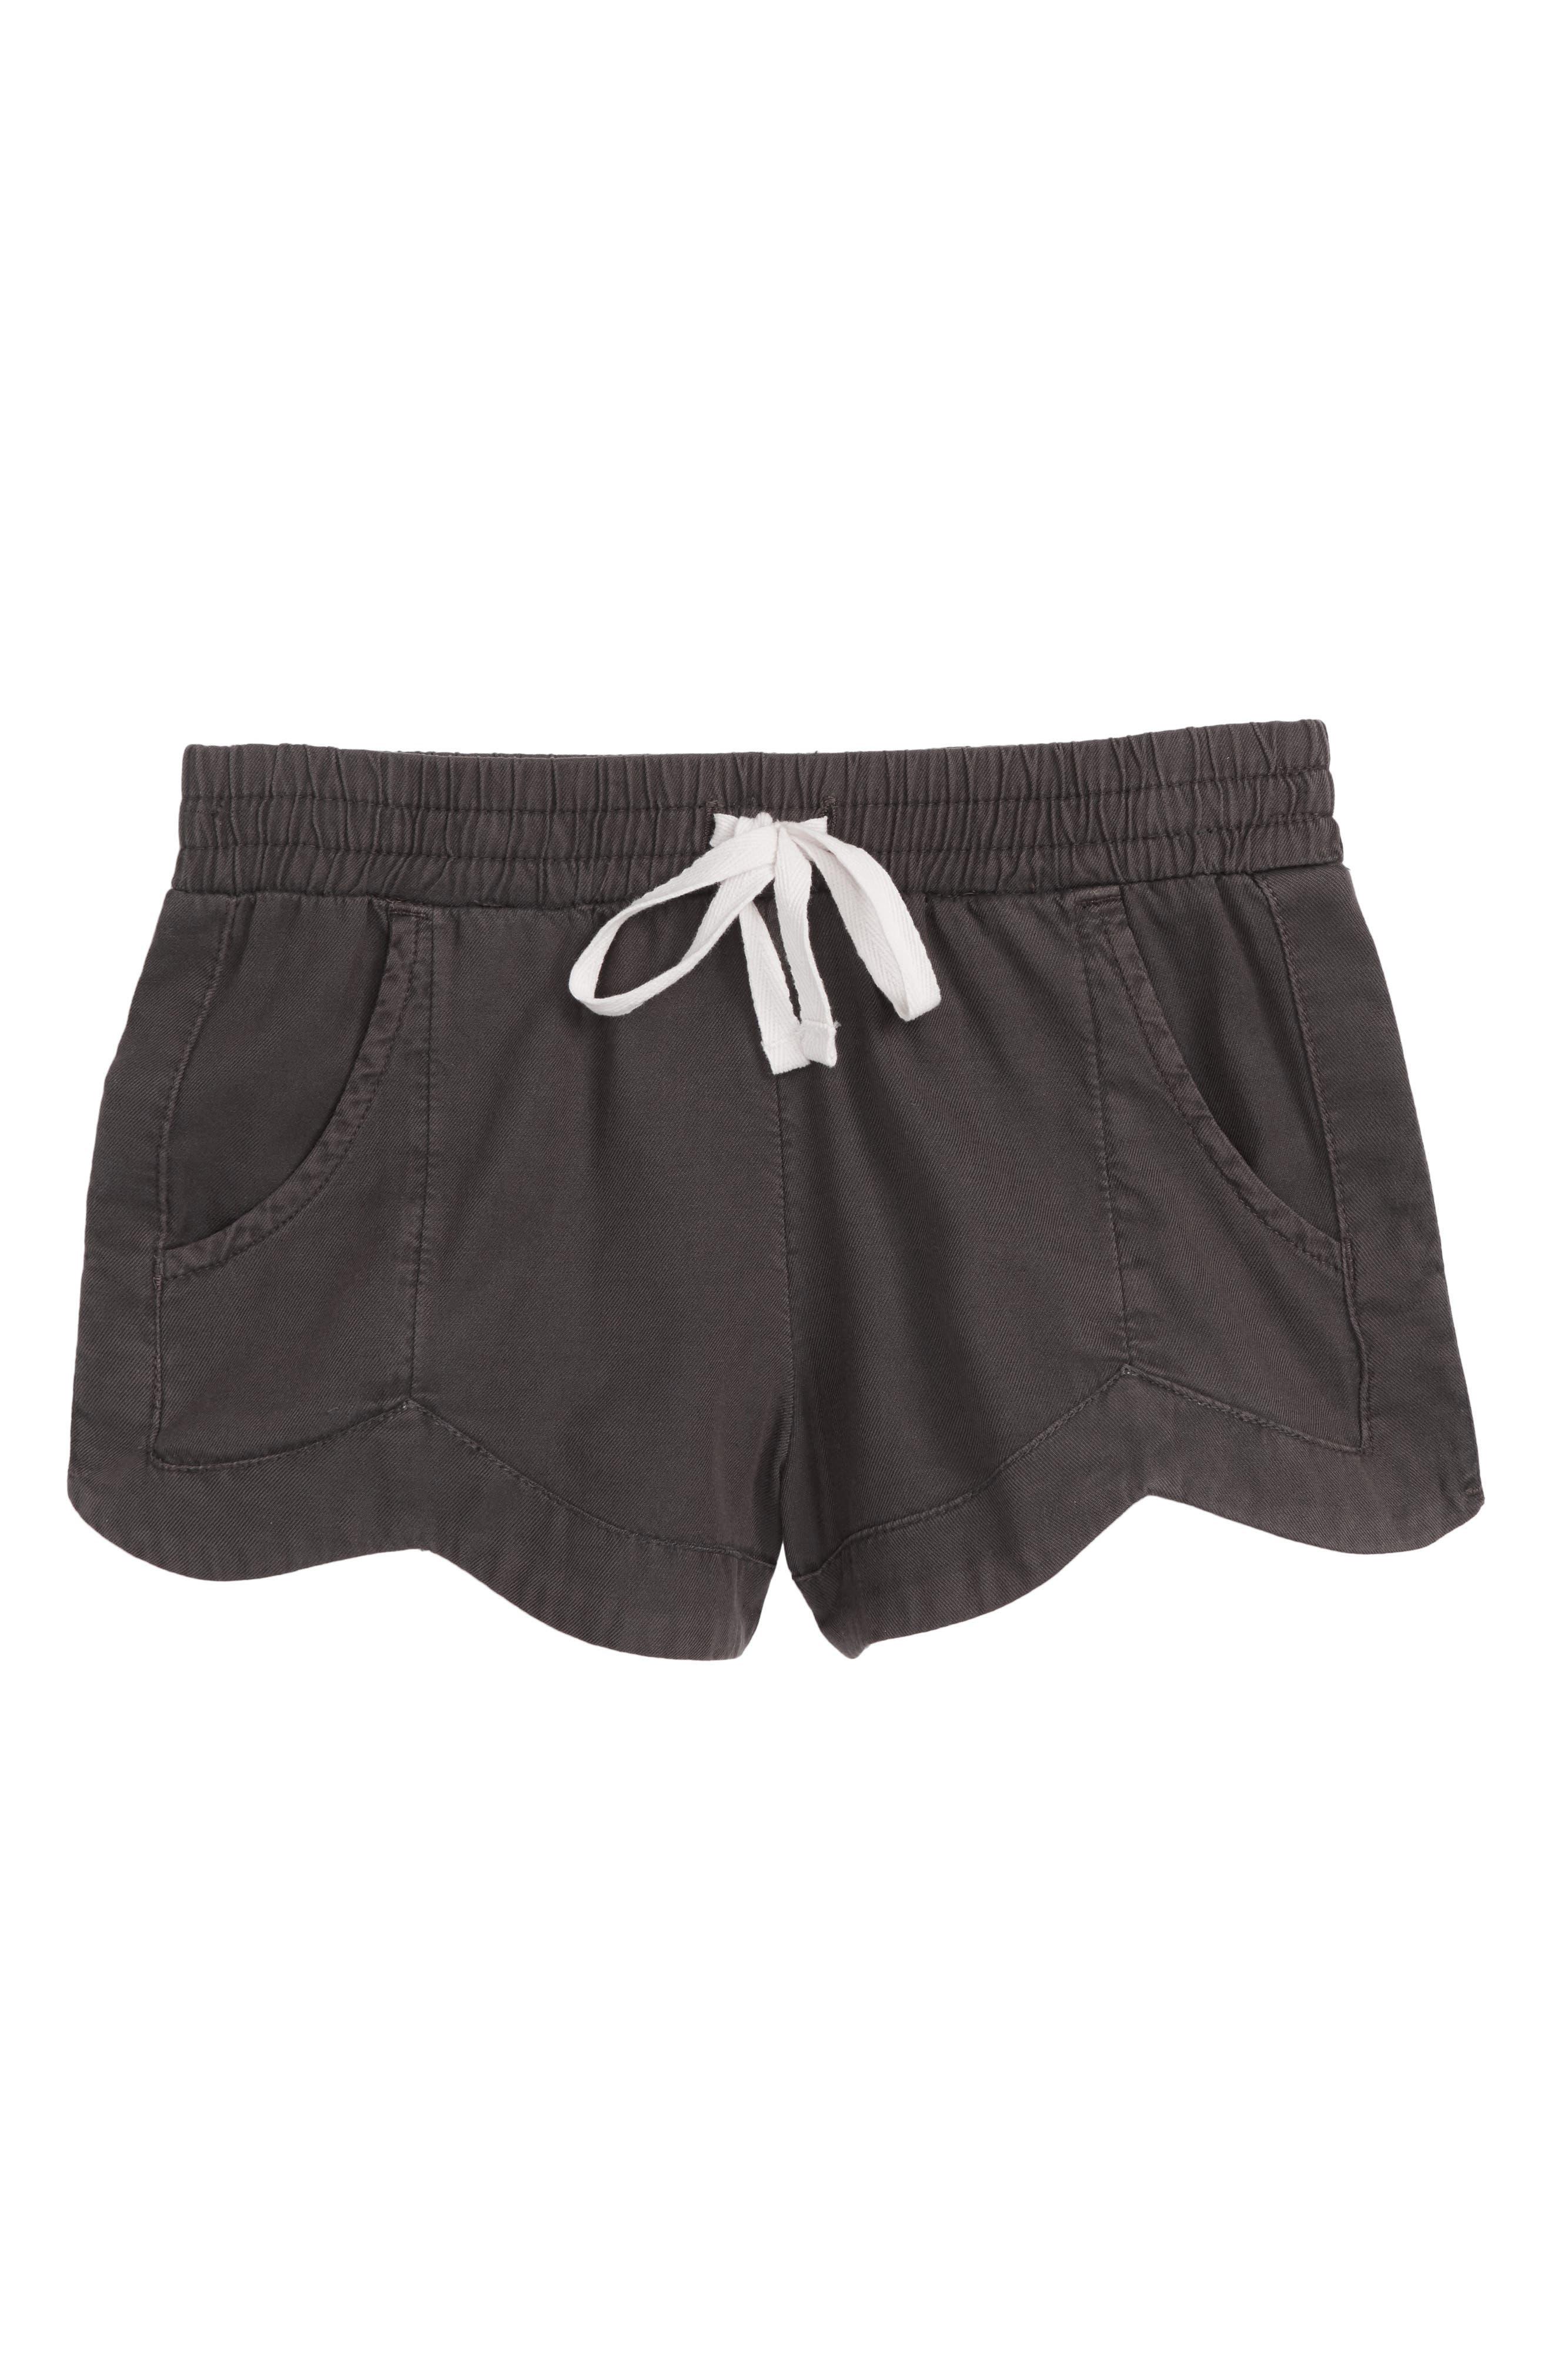 Girls Billabong Made For You Woven Shorts Size M (1012)  Black